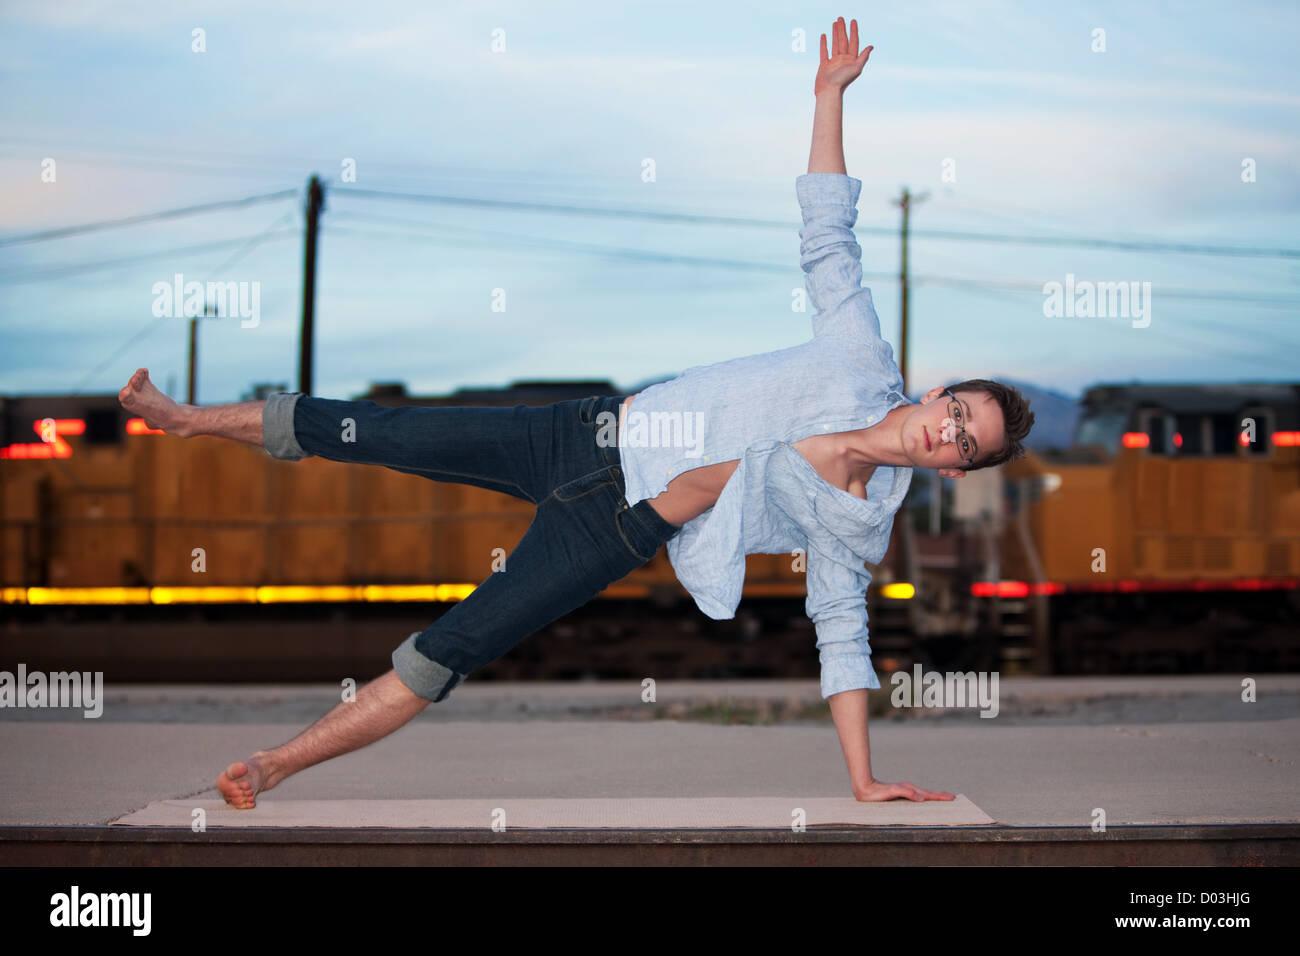 Caucasian man performing the Half Moon yoga position - Stock Image